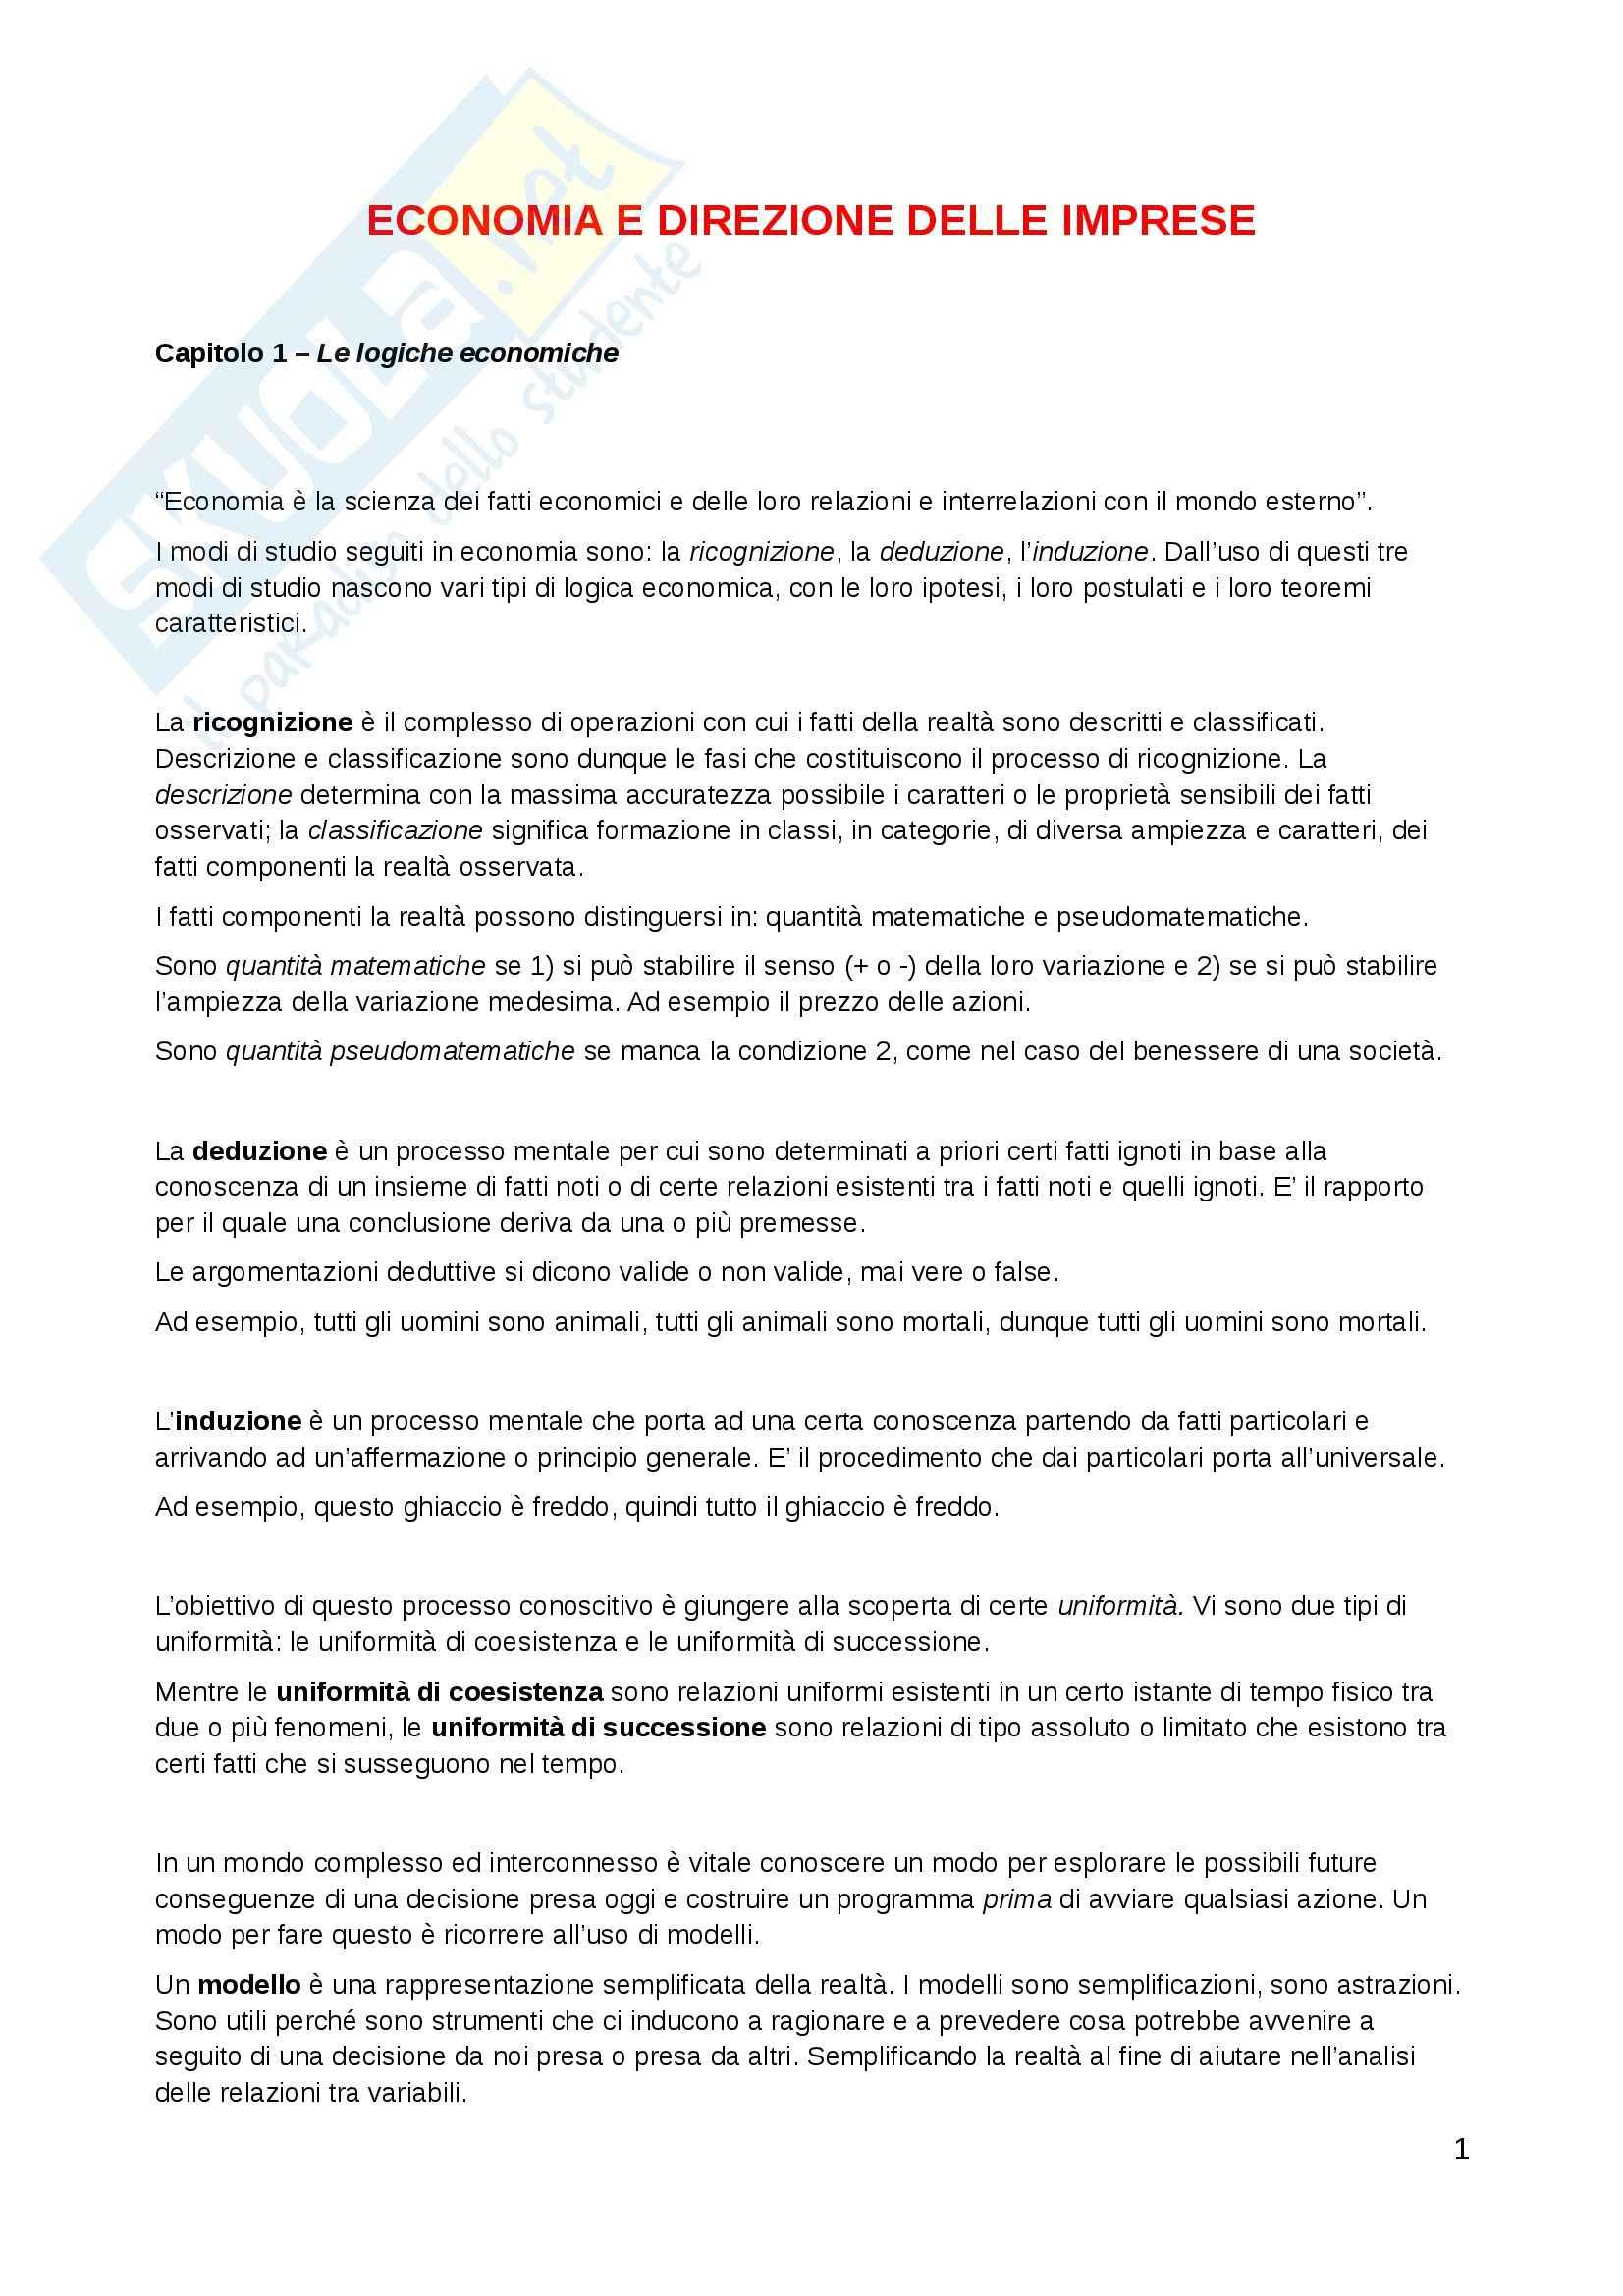 appunto G. Tardivo Economia delle imprese